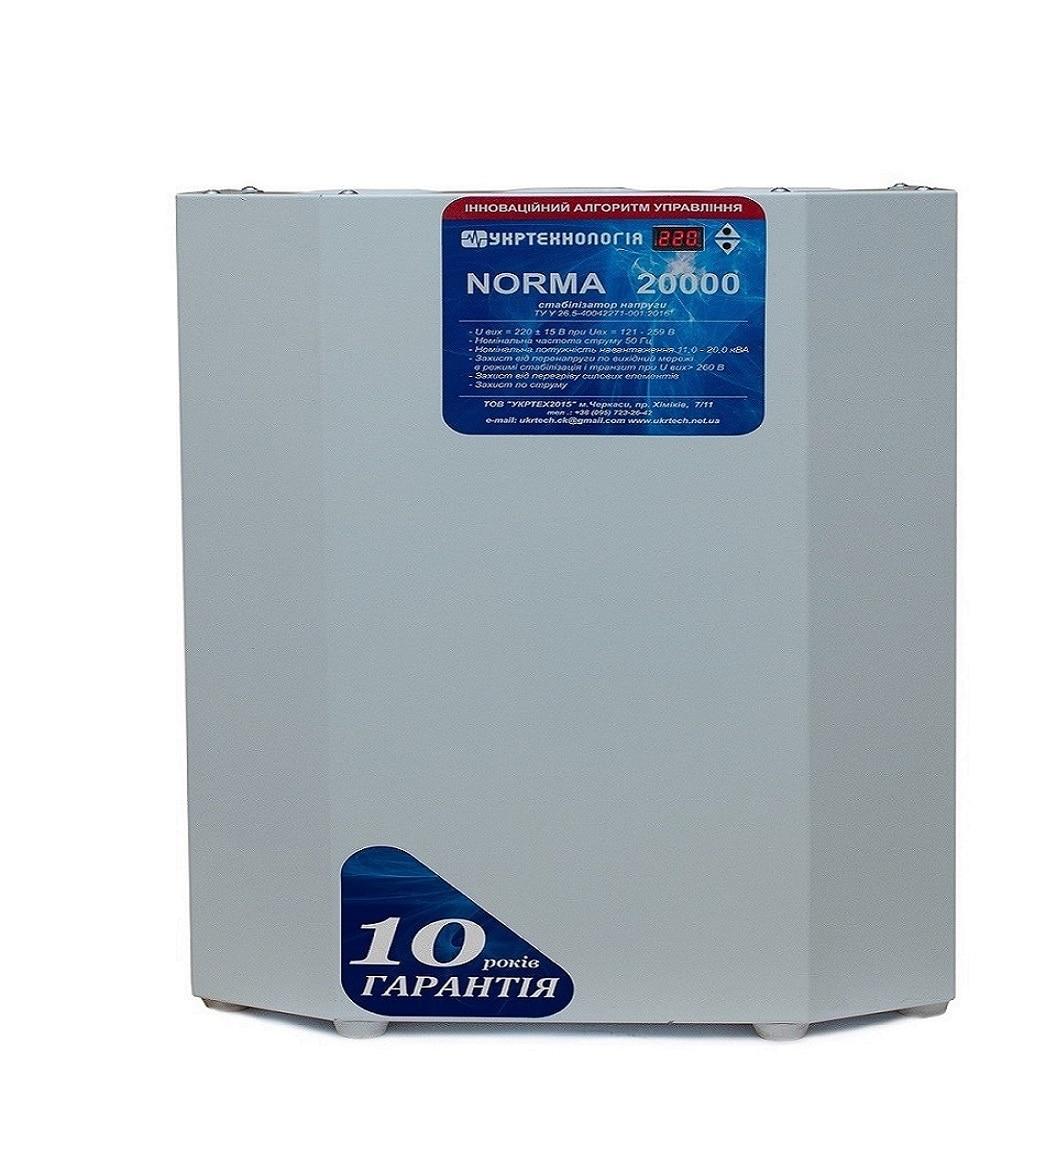 Для дома - Стабилизатор напряжения 20 кВт NORMA 000001379 - Фото 1